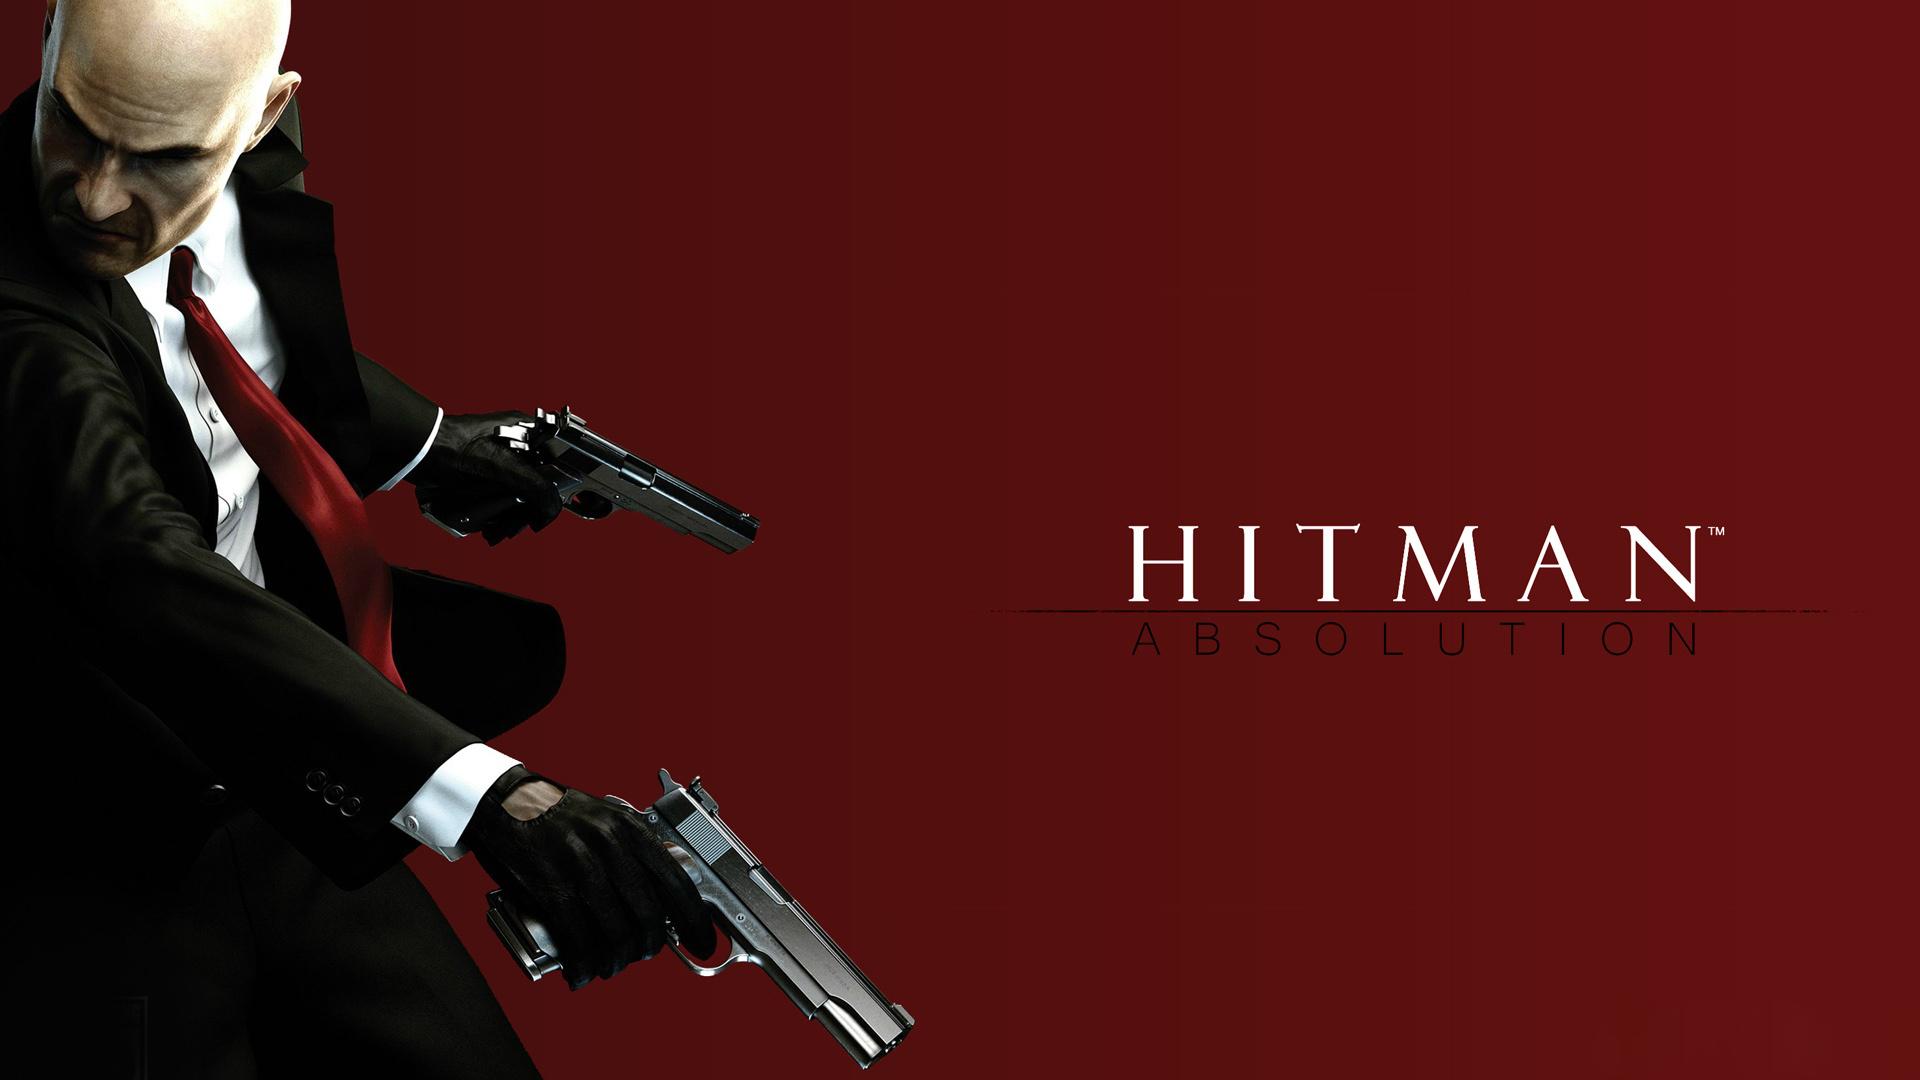 hitman absolution hd wallpaper 1600x900 - photo #36